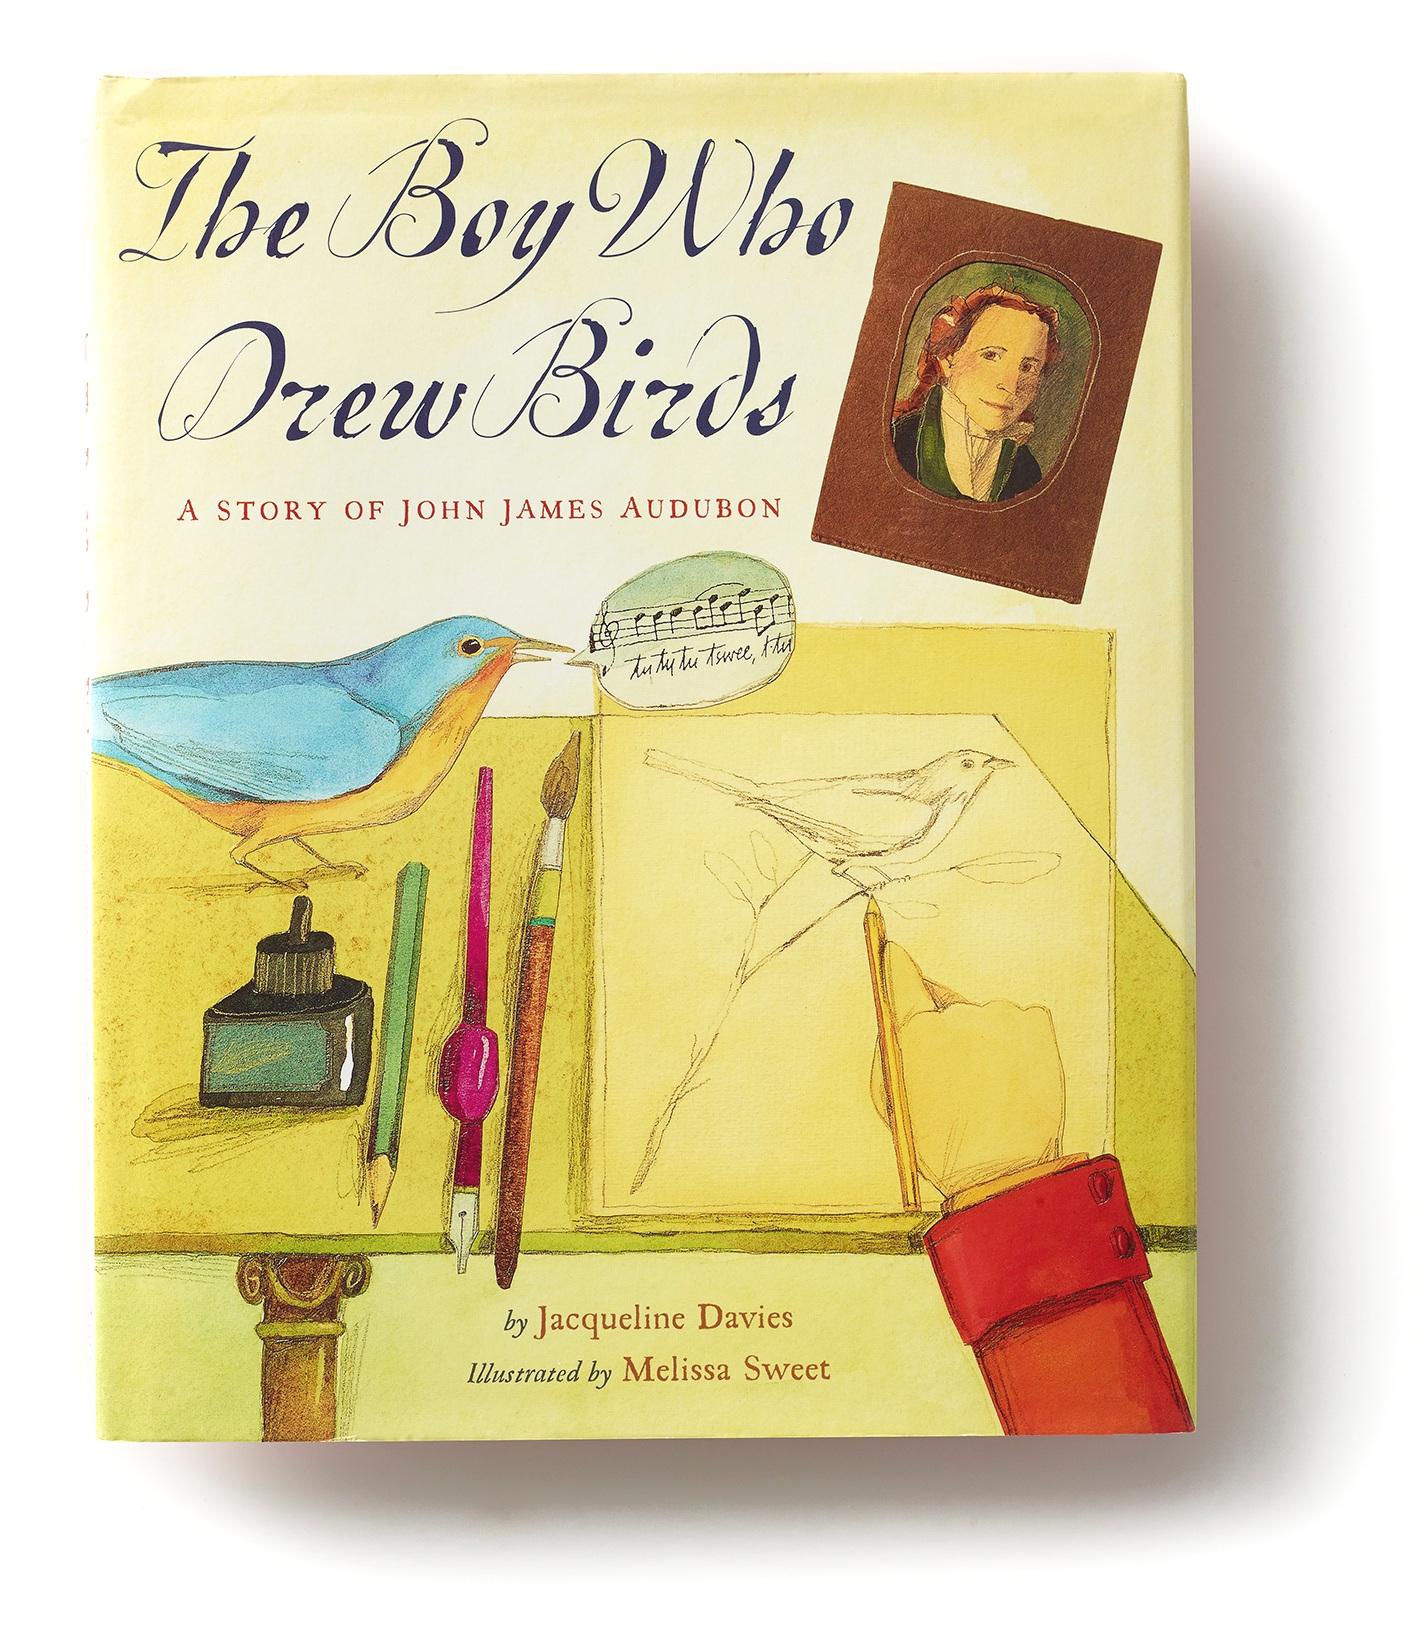 The Boy Who Drew Birds Cover.jpg